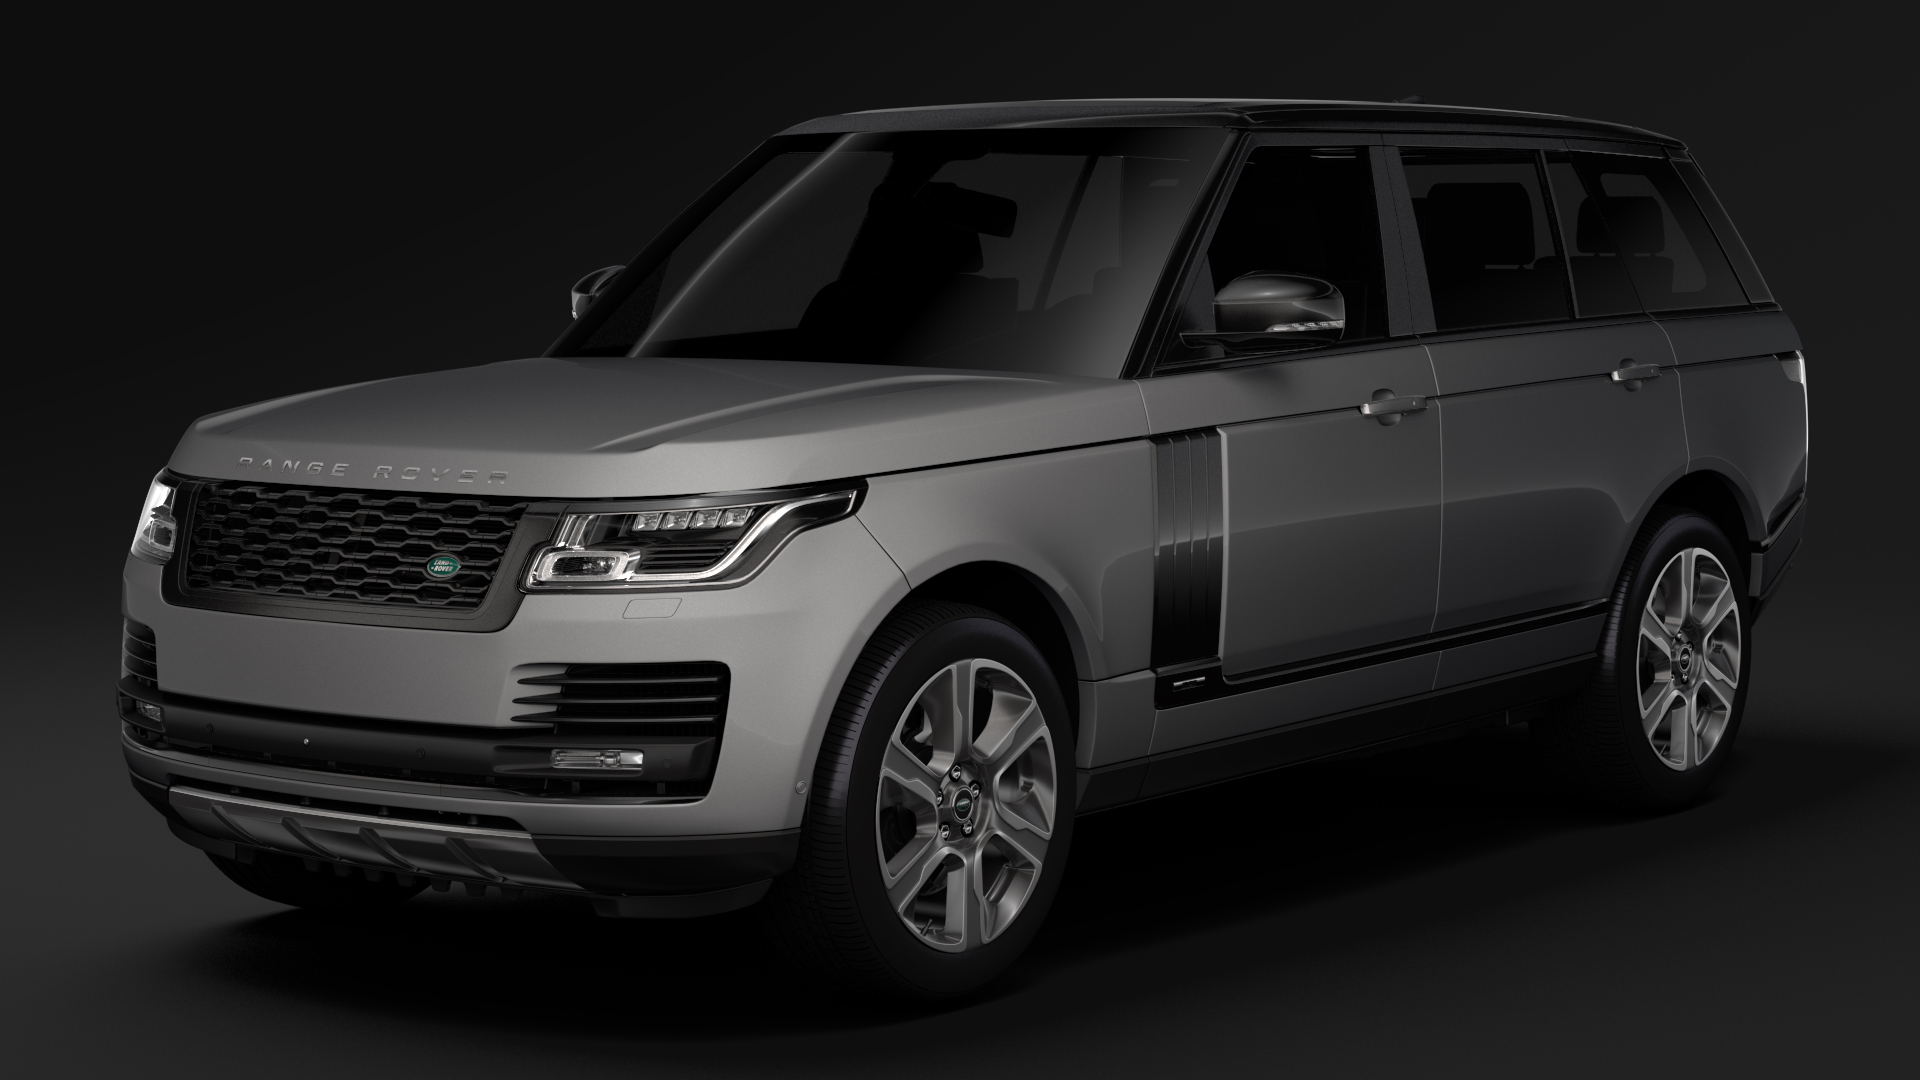 range rover vogue lwb l405 2018 3d model max fbx c4d lwo ma mb hrc xsi obj 277523